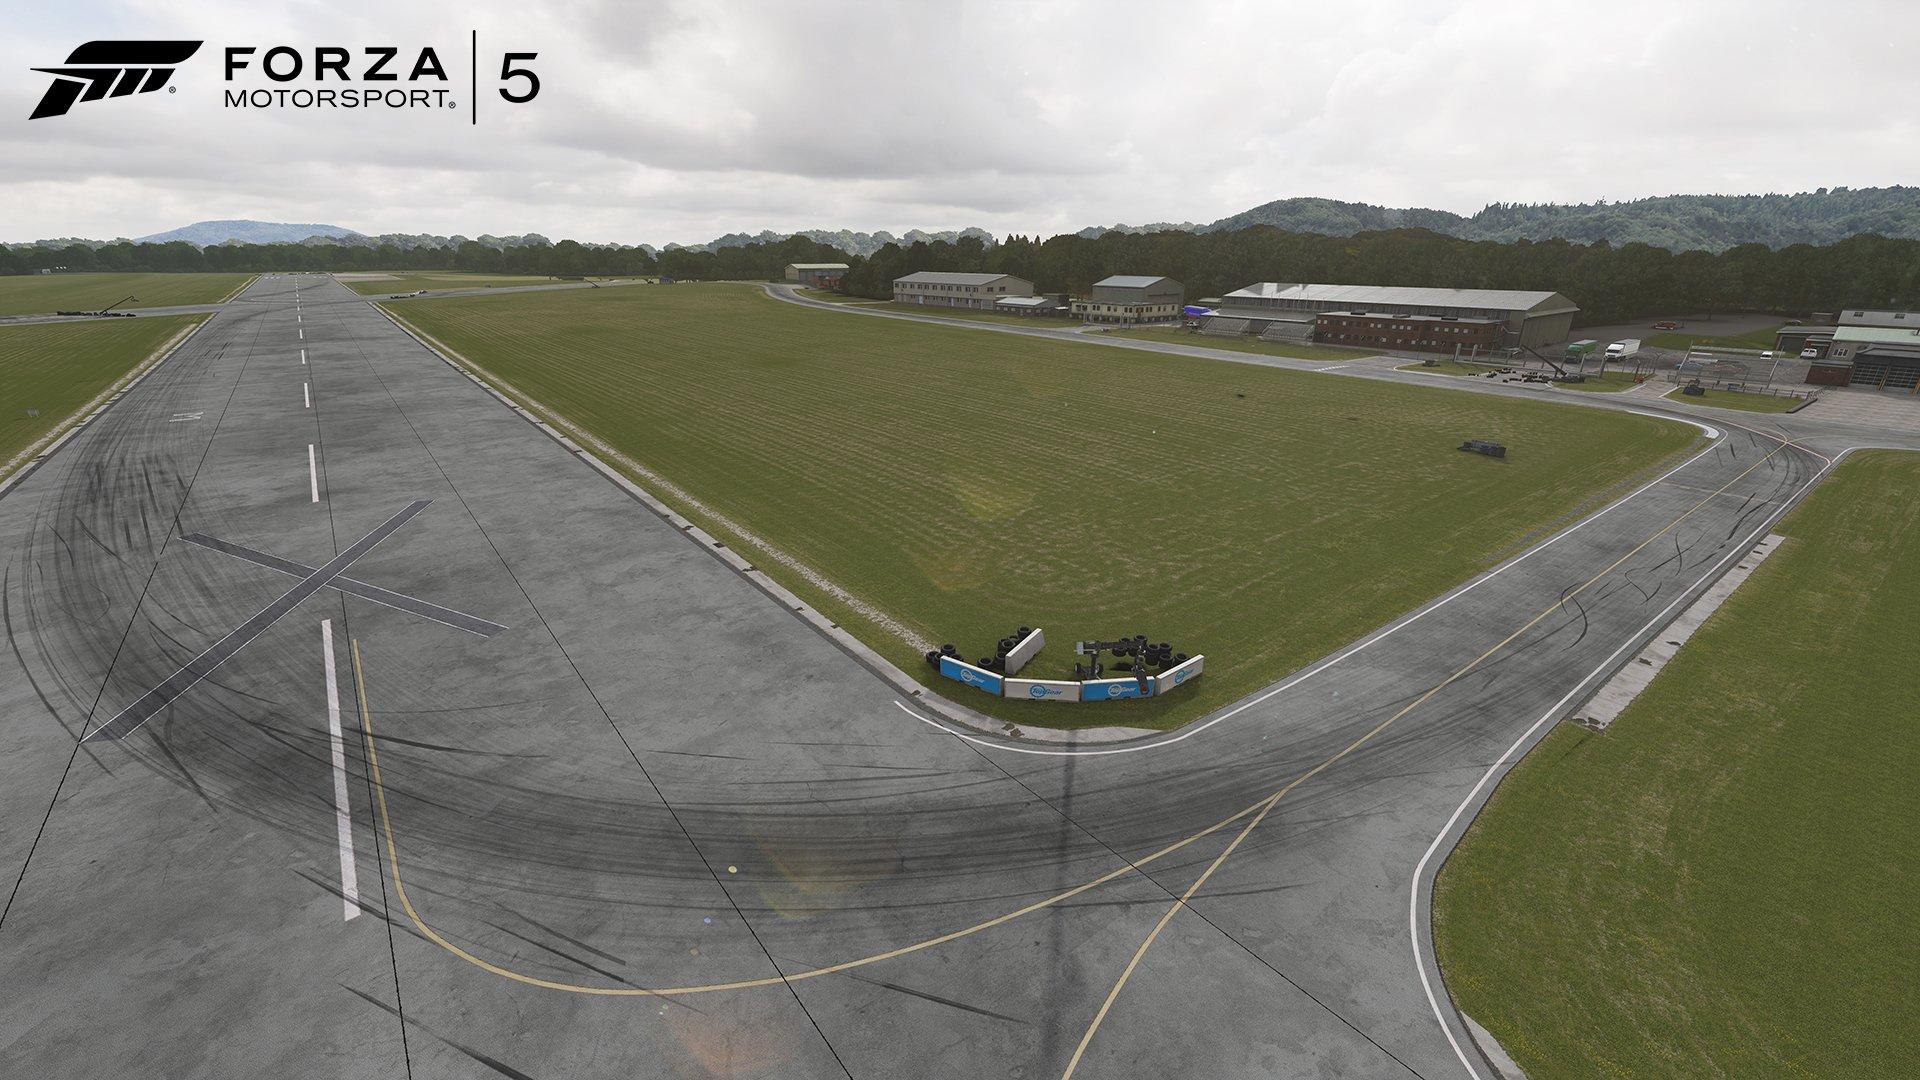 Forza Motorsport 5 Modern Hypercar Career Video Top